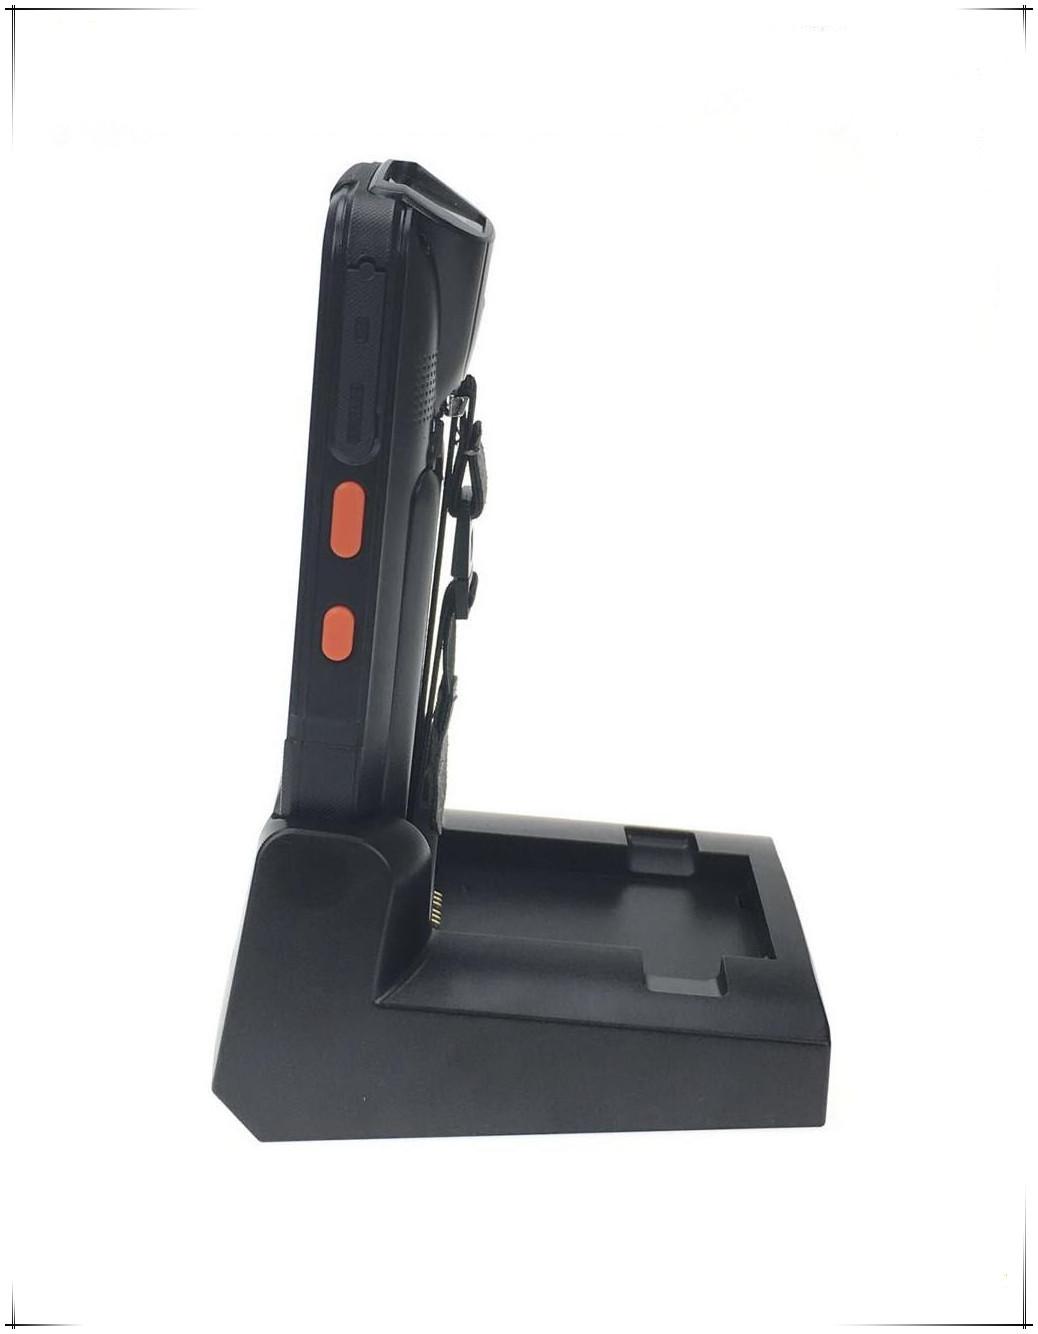 BA - Pistola tramite Corriere CNC Androide 5.1 1D e 2D Codice TAC Pistola GPS palmare Wireless Bluetooth